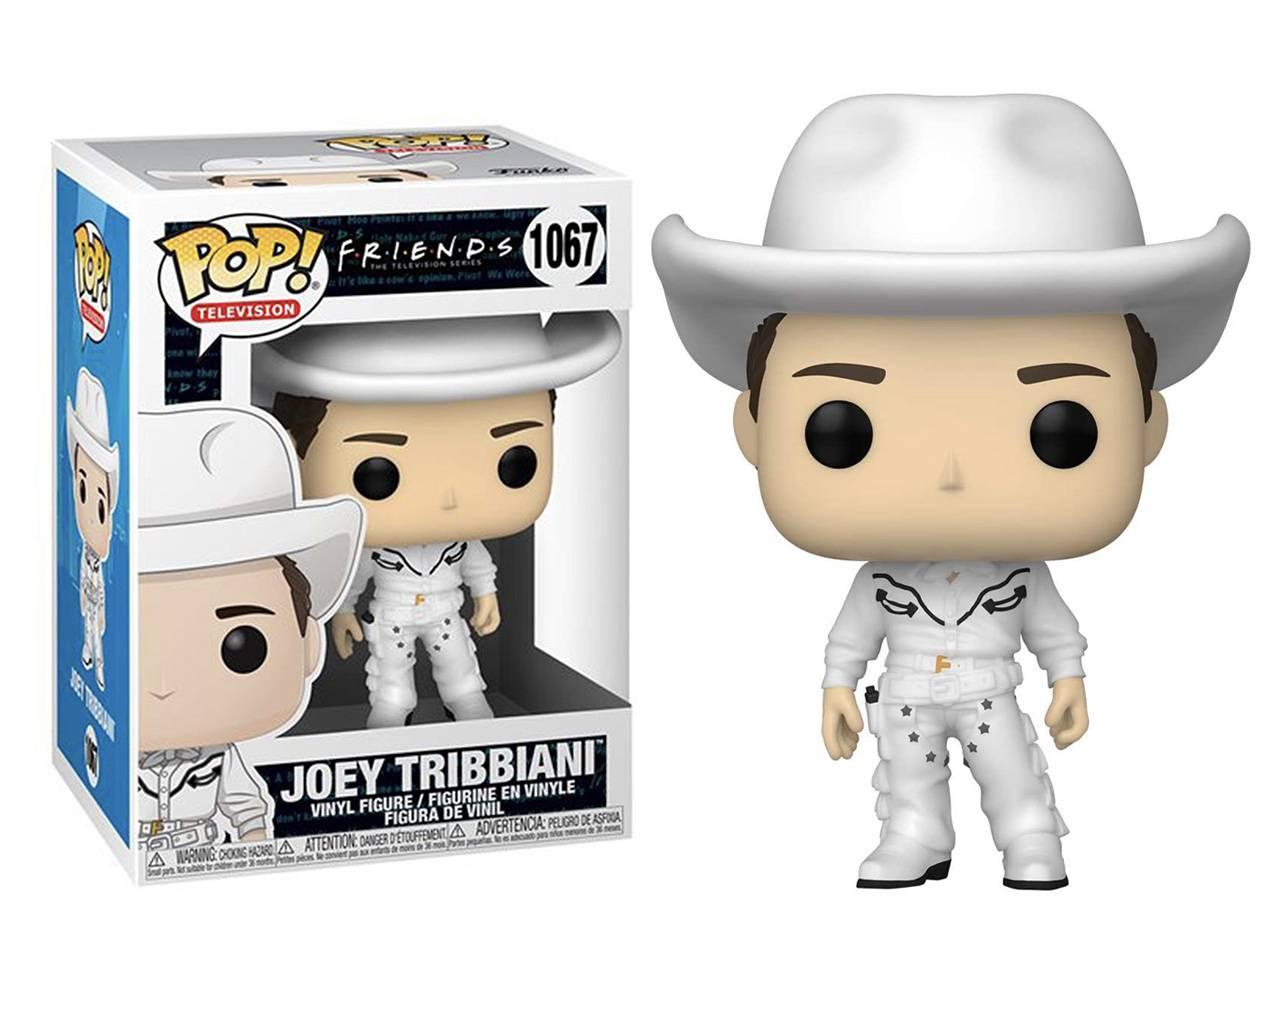 Joey Tribbiani (Cowboy) Pop! Vinyl